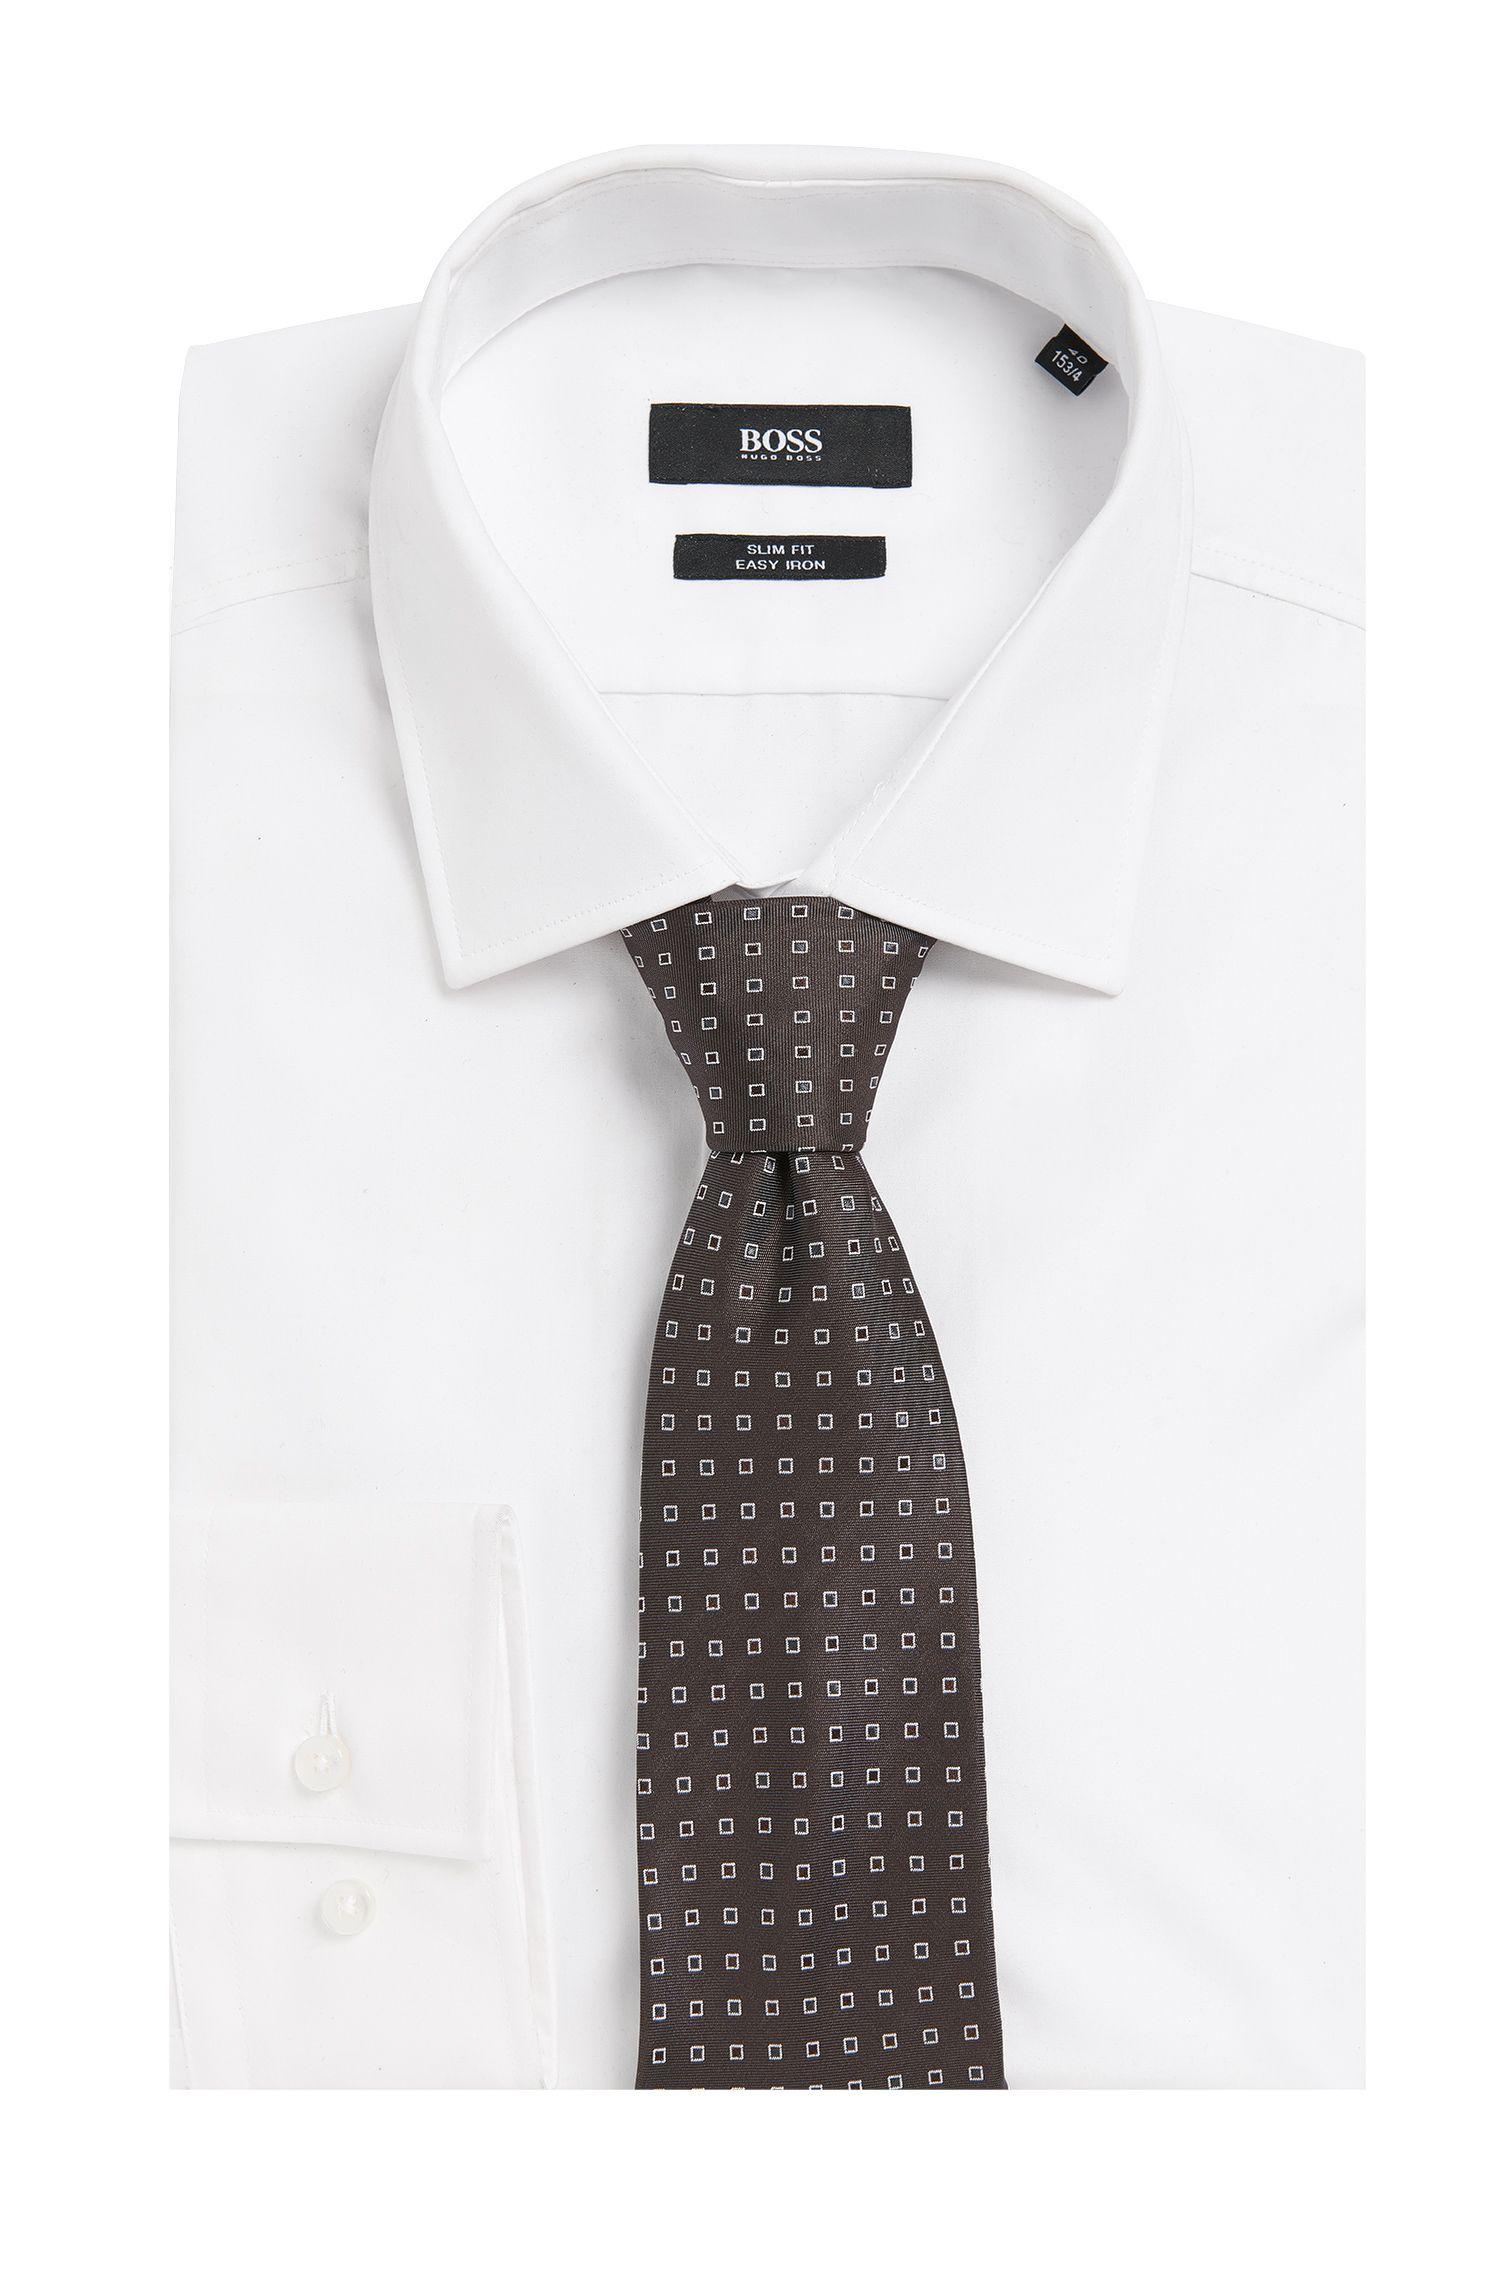 Gemusterte Krawatte aus Seide: Tie 7,5 cm'